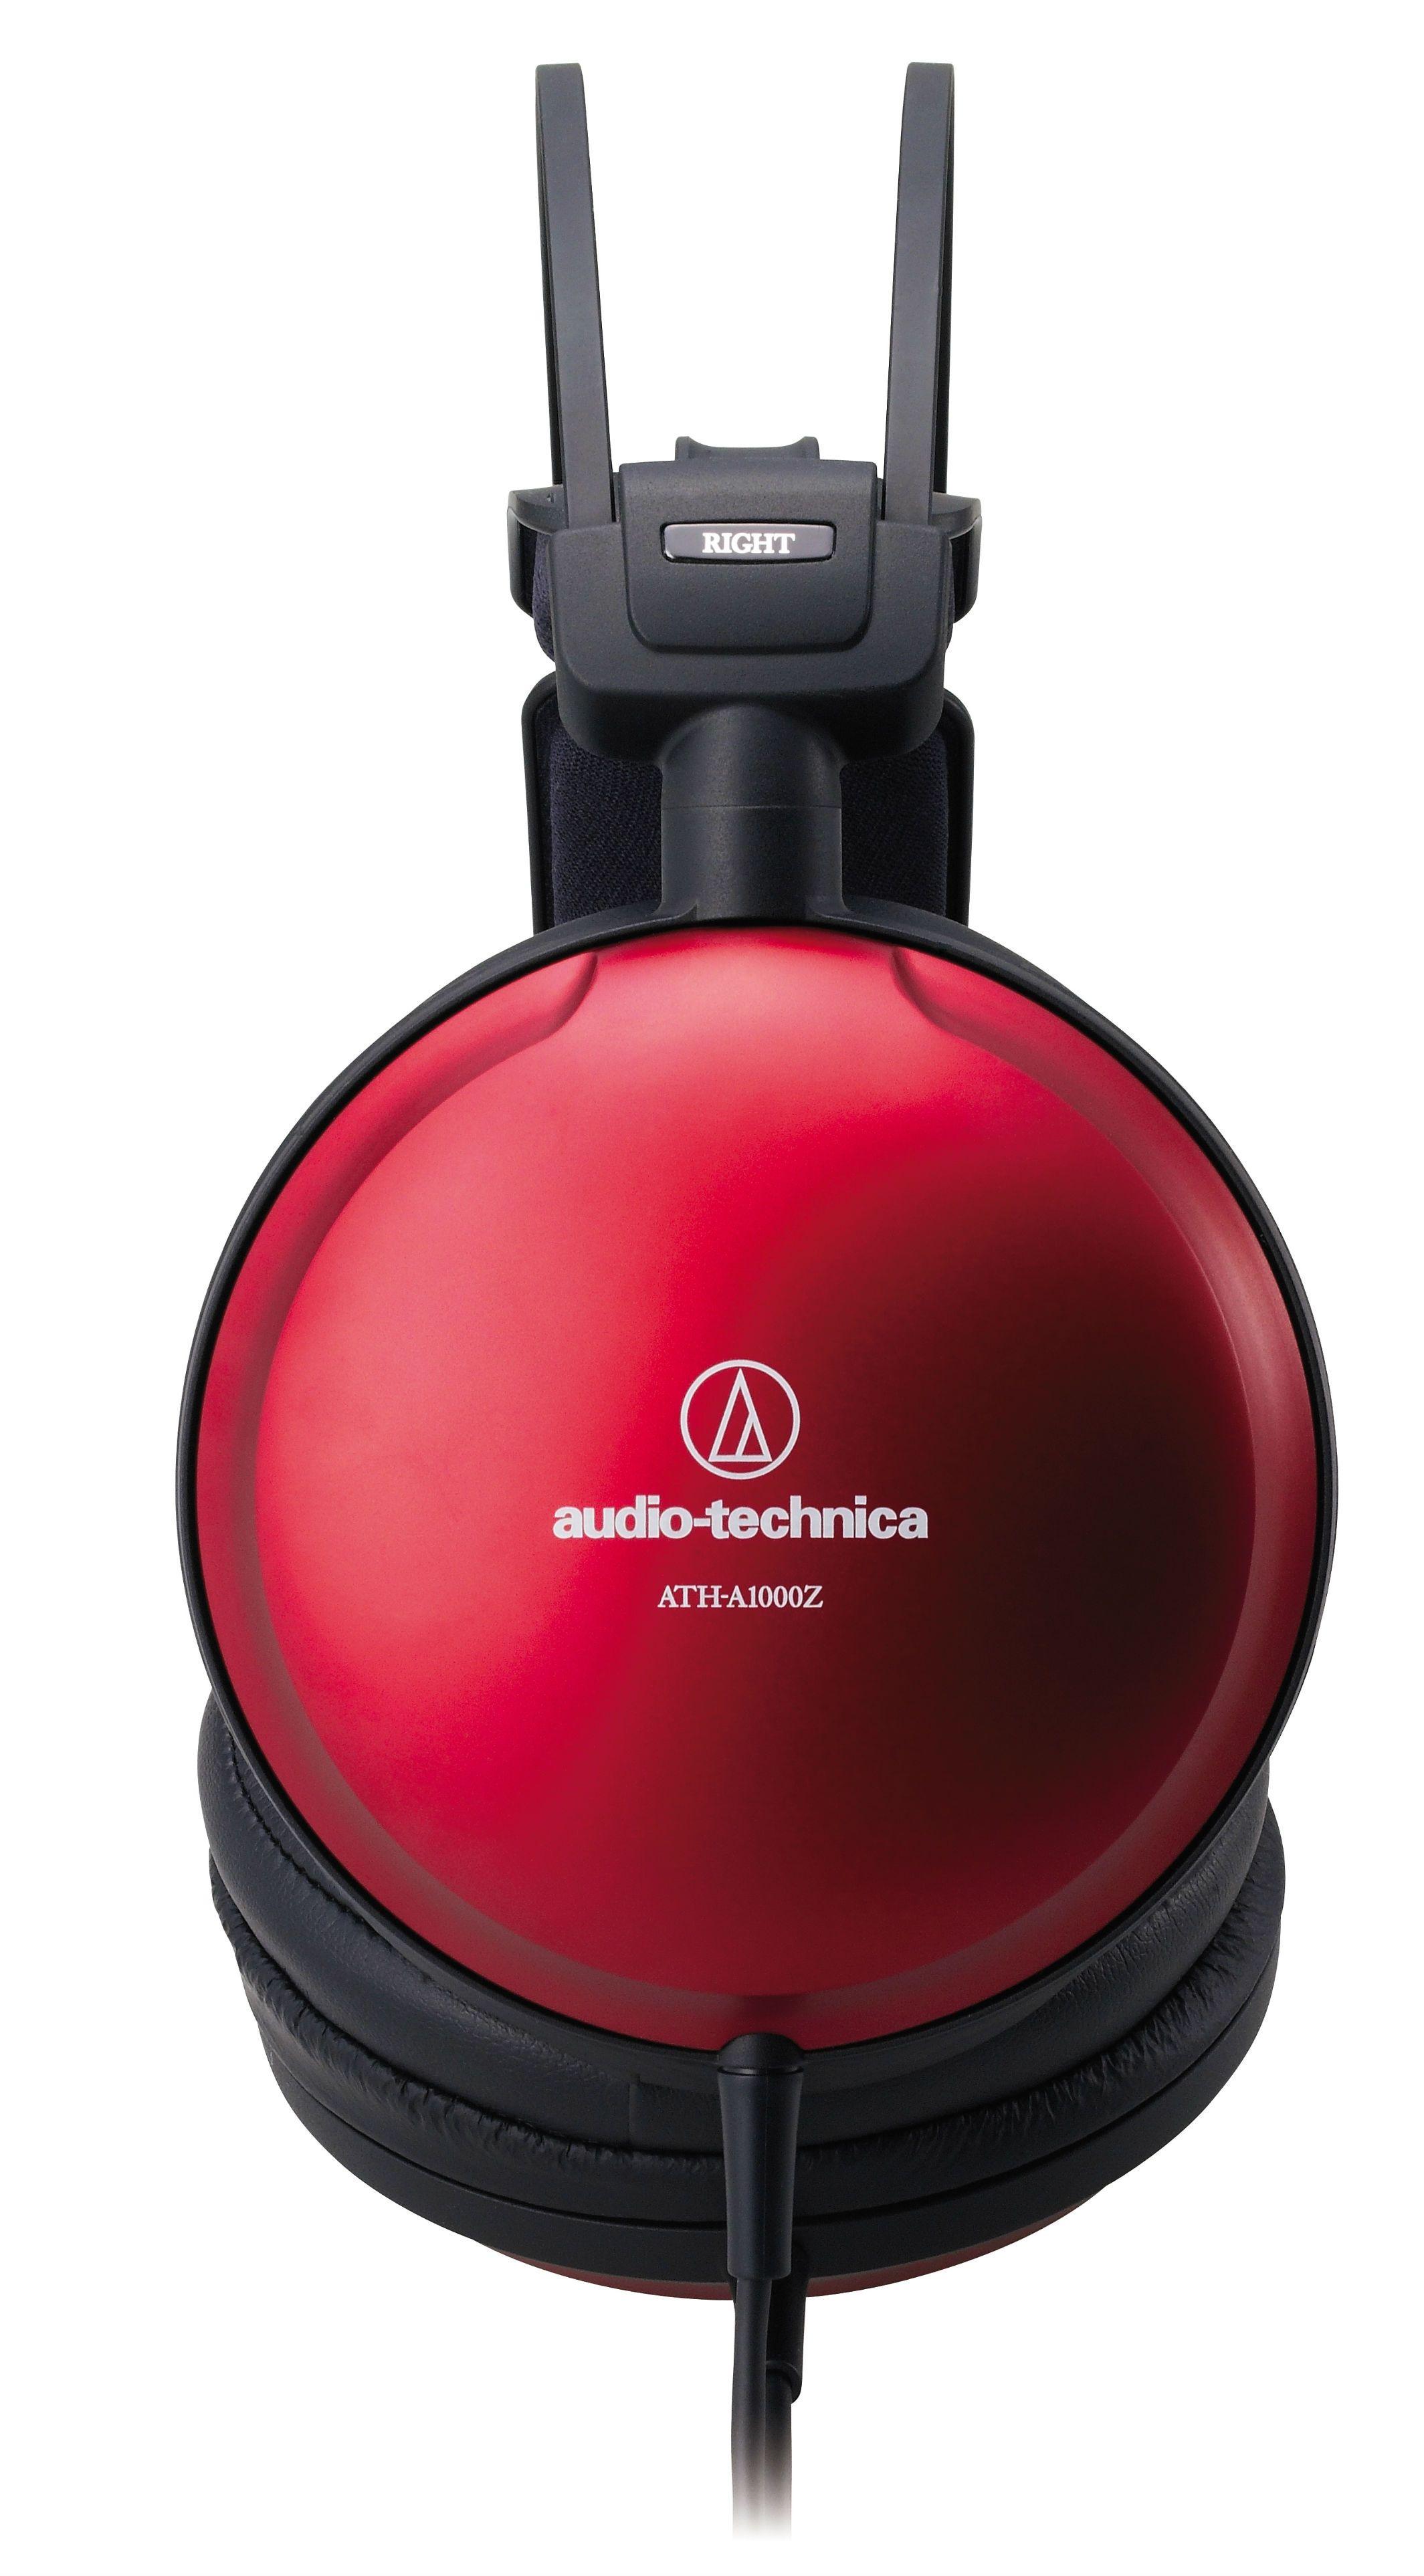 Слушалки Audio-Technica - ATH-A1000Z Art Monitor, hi-fi, червени - 2